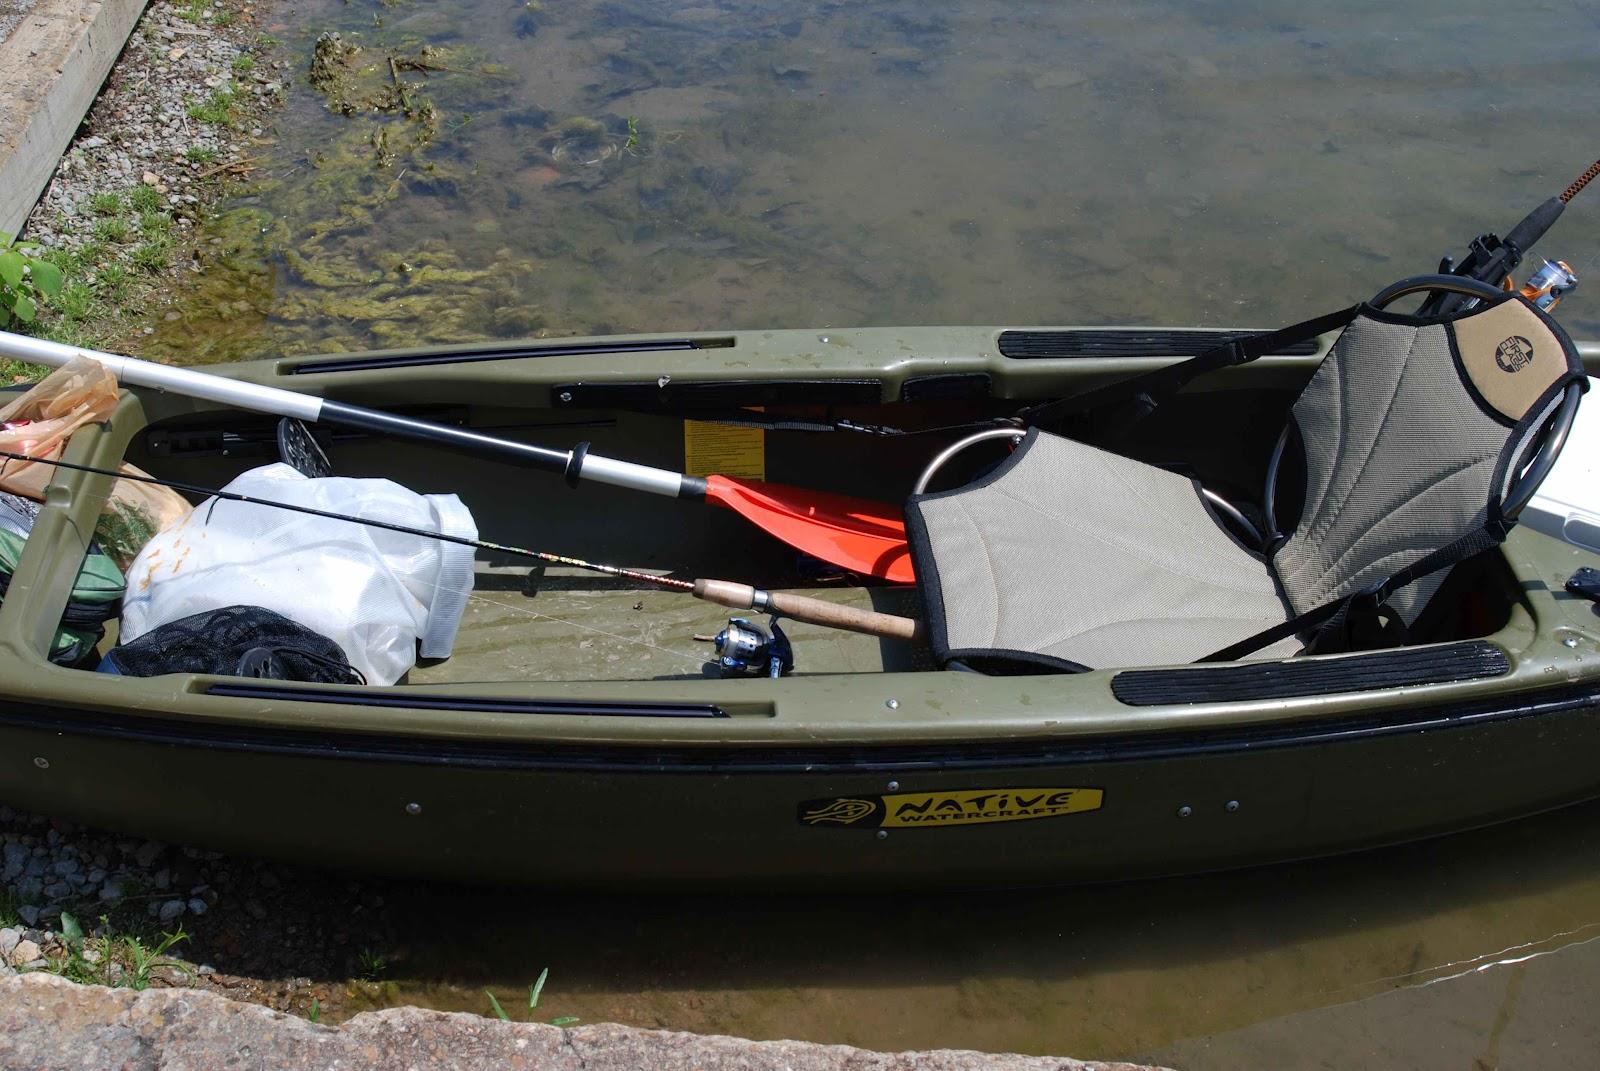 Larry Chair Kayak Booster Seat Asda Old Field Studio Fisherman Goes Native